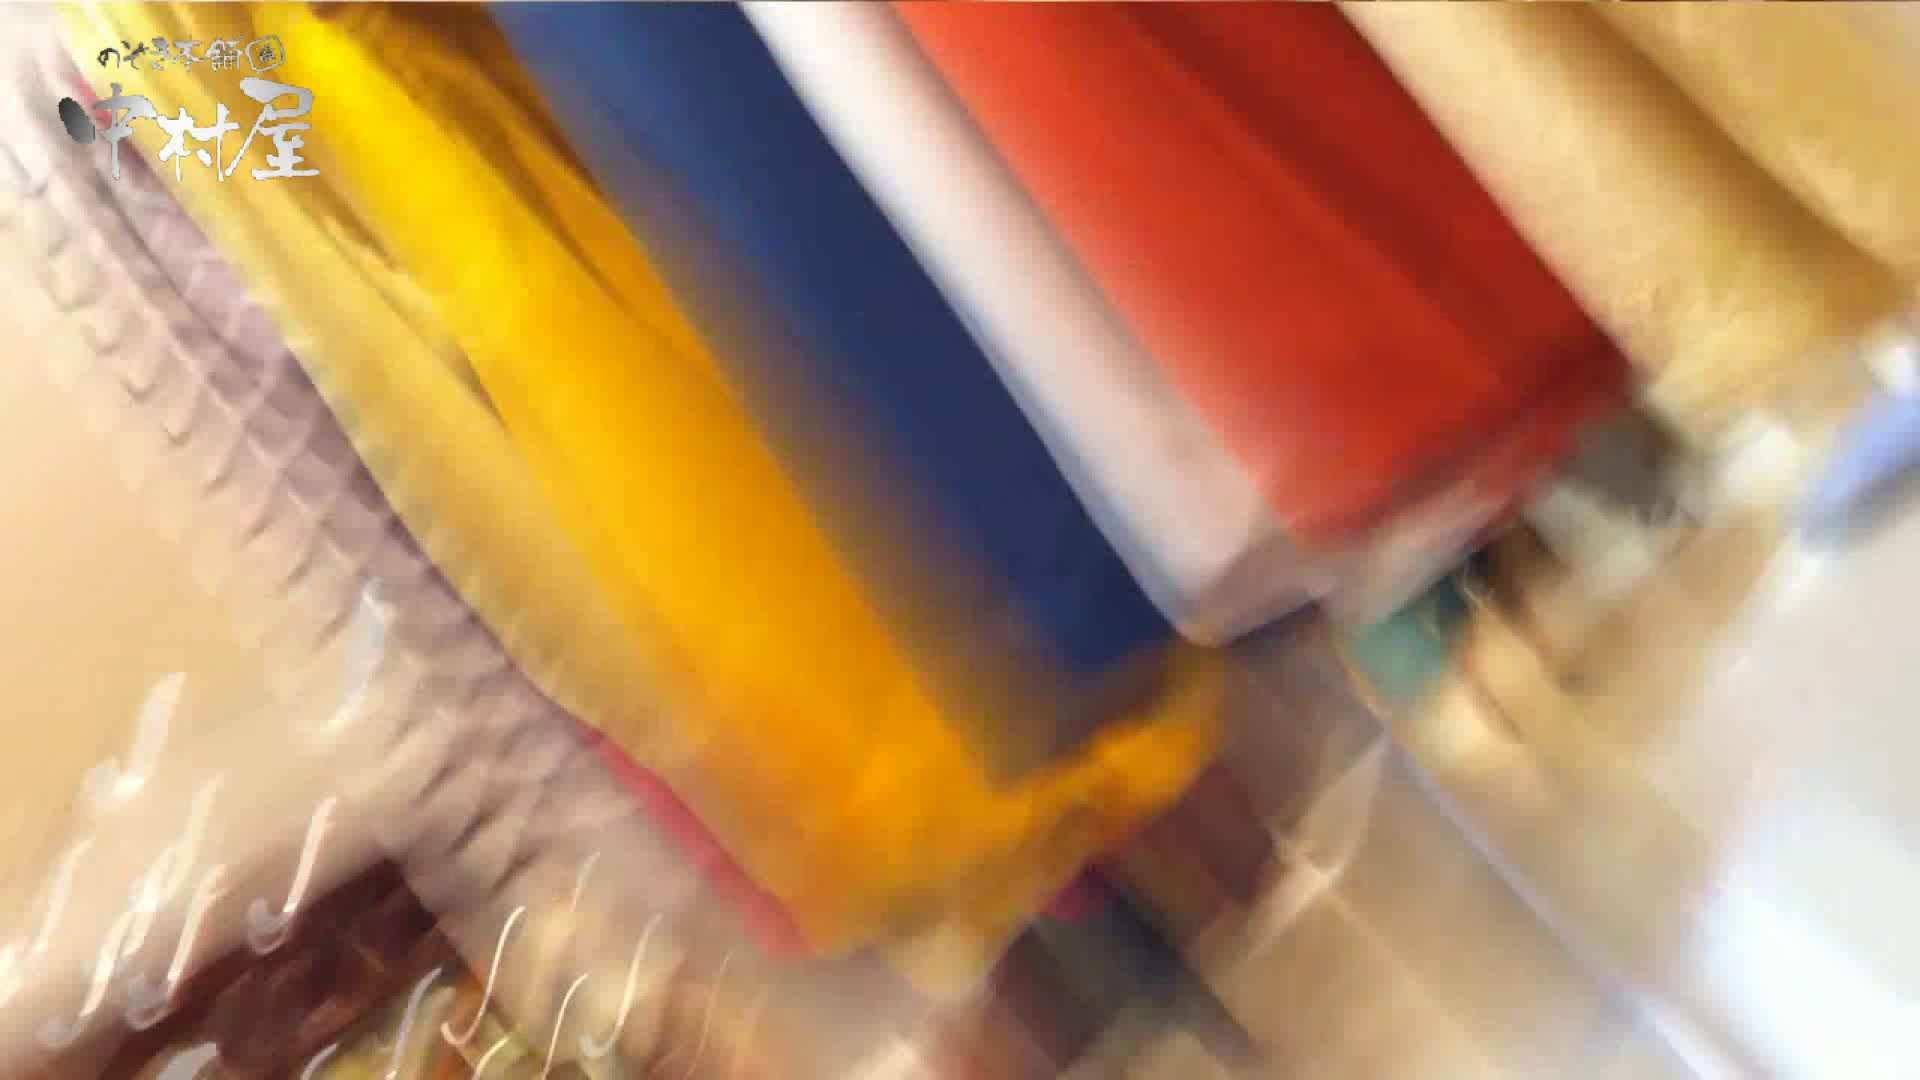 vol.47 カリスマ店員胸チラ&パンチラ 黒パン店員さん チラ | パンチラ  83pic 23